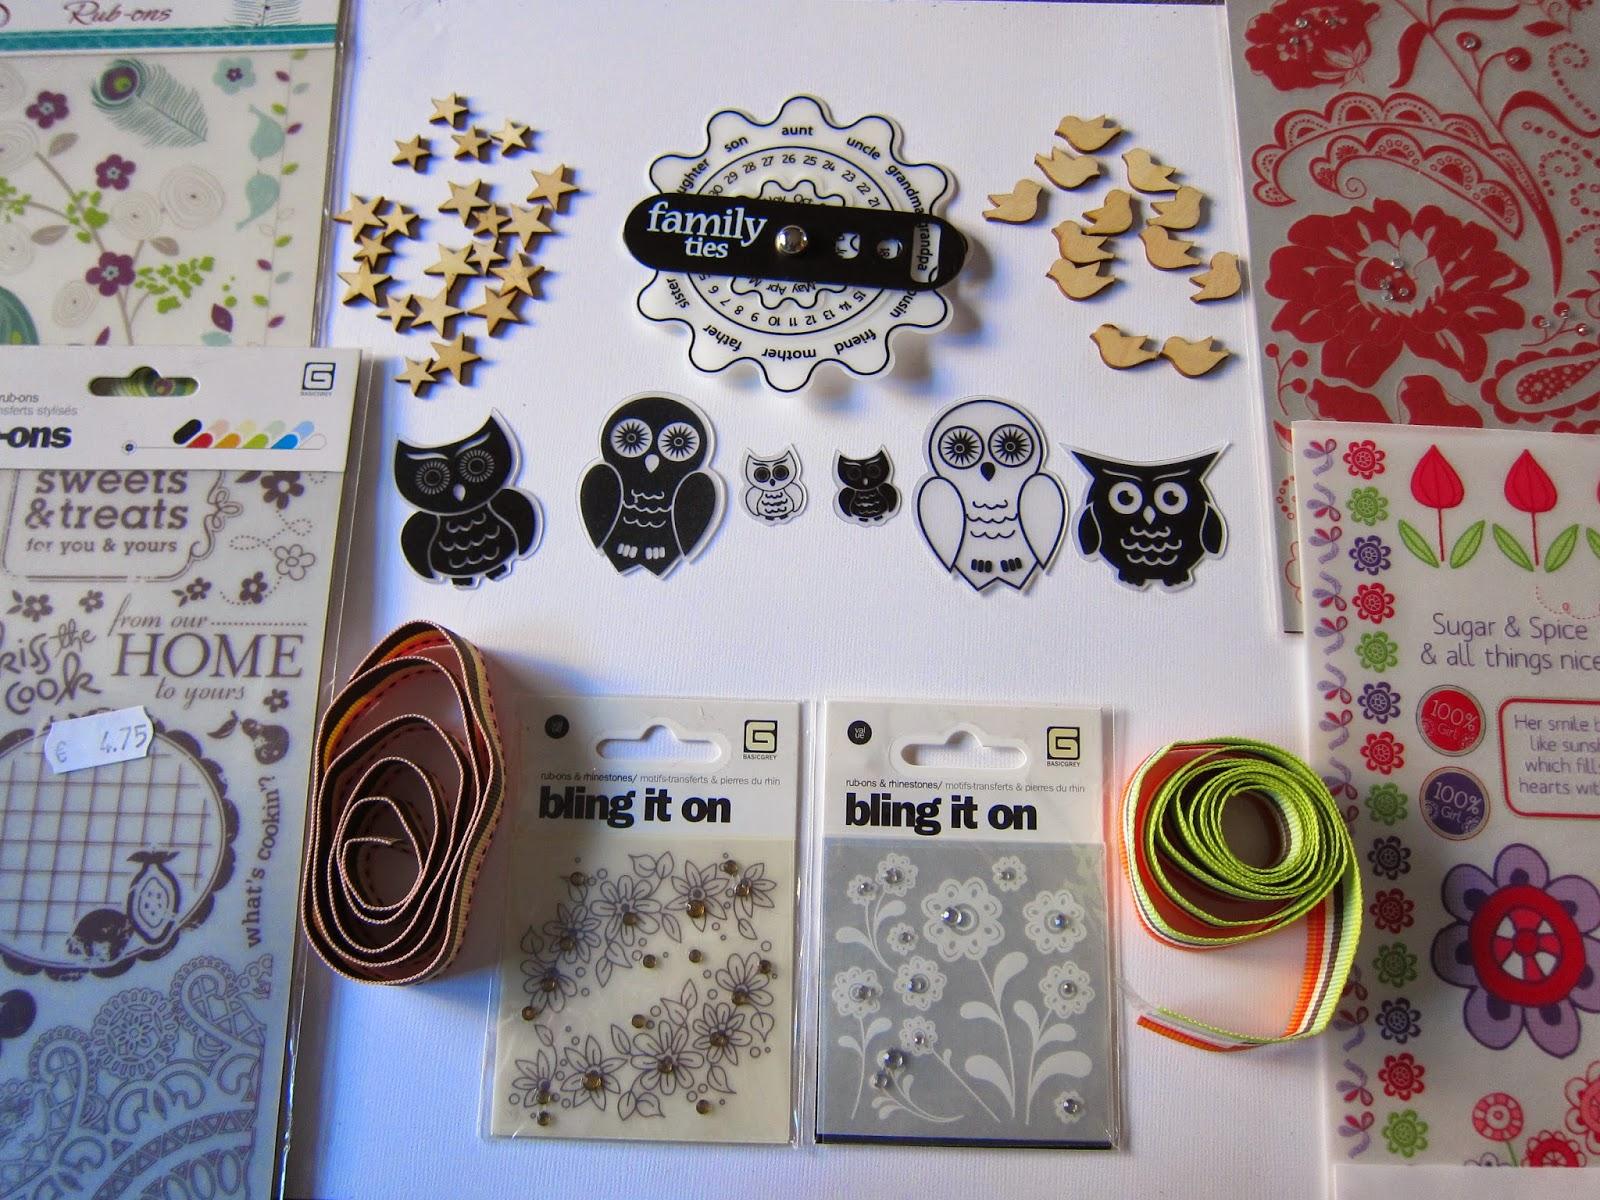 http://karien43.blogspot.nl/2014/11/verjaardags-candy.html